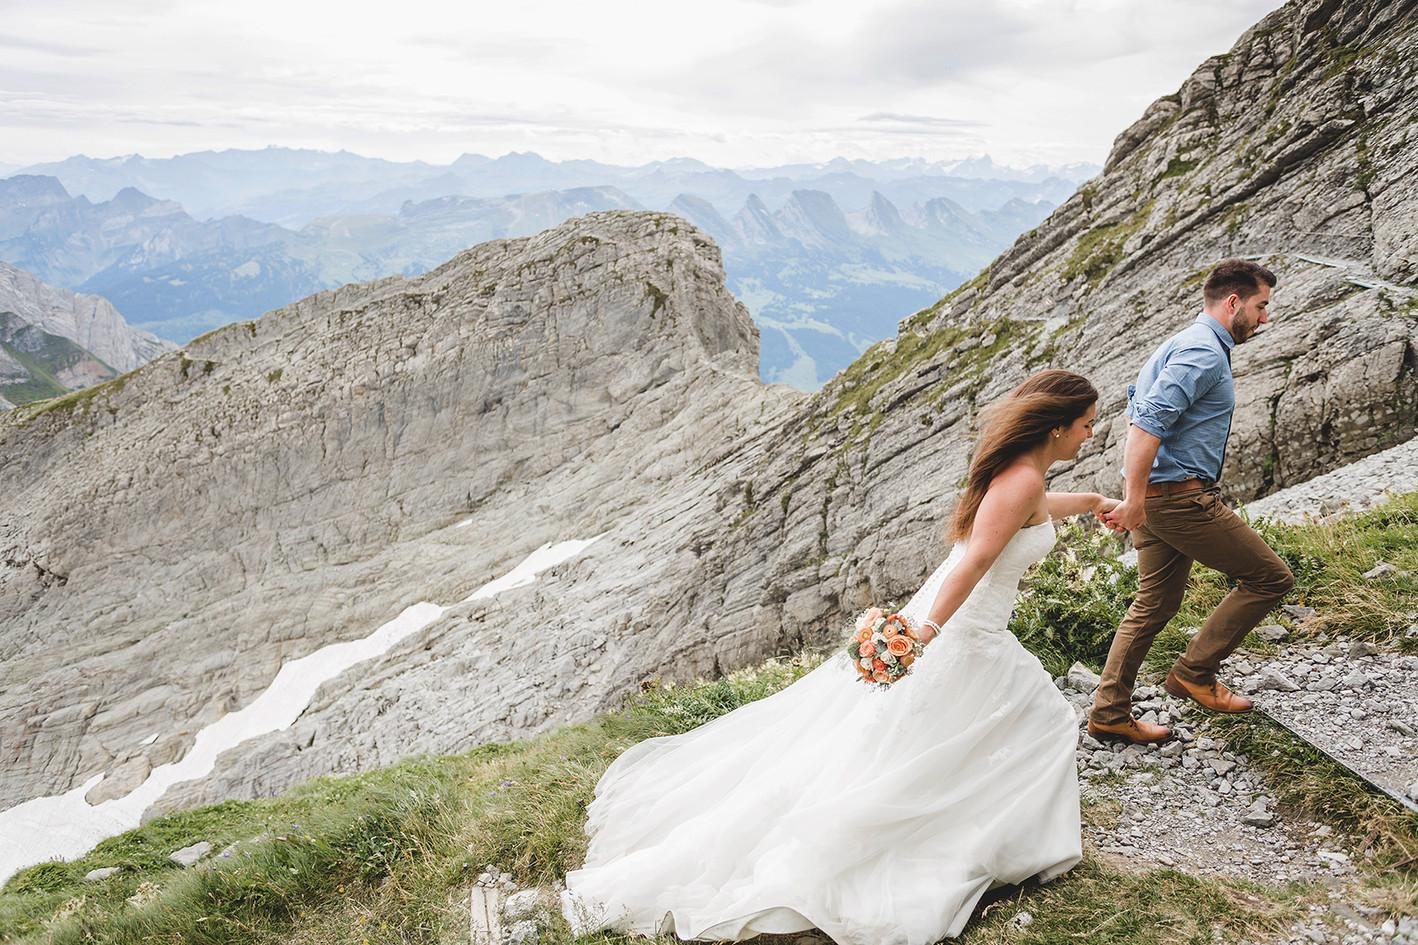 036-married-united-wedding-suephotoart-p